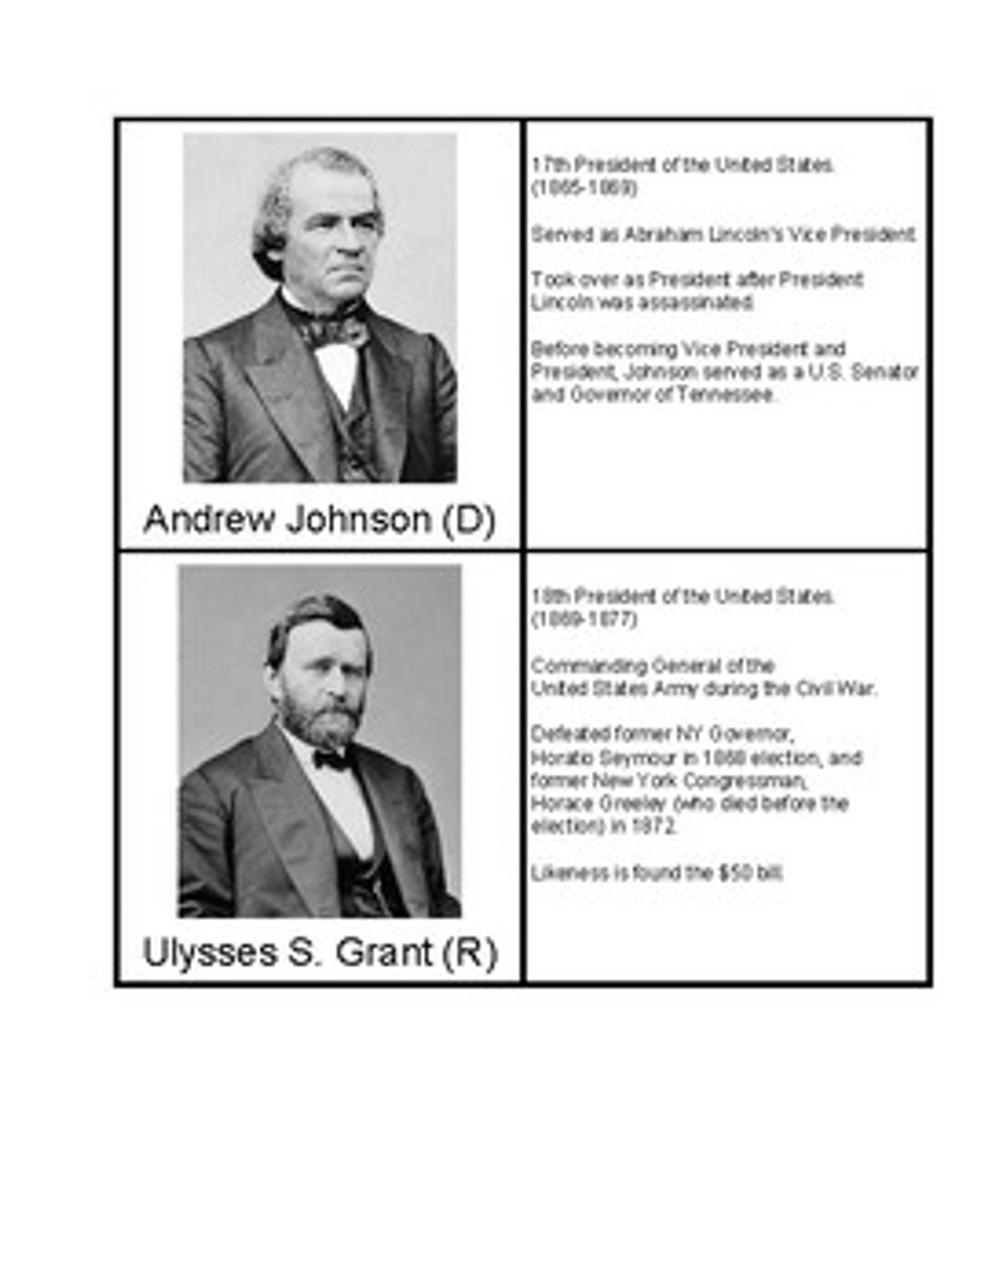 U.S. Presidents 11-20